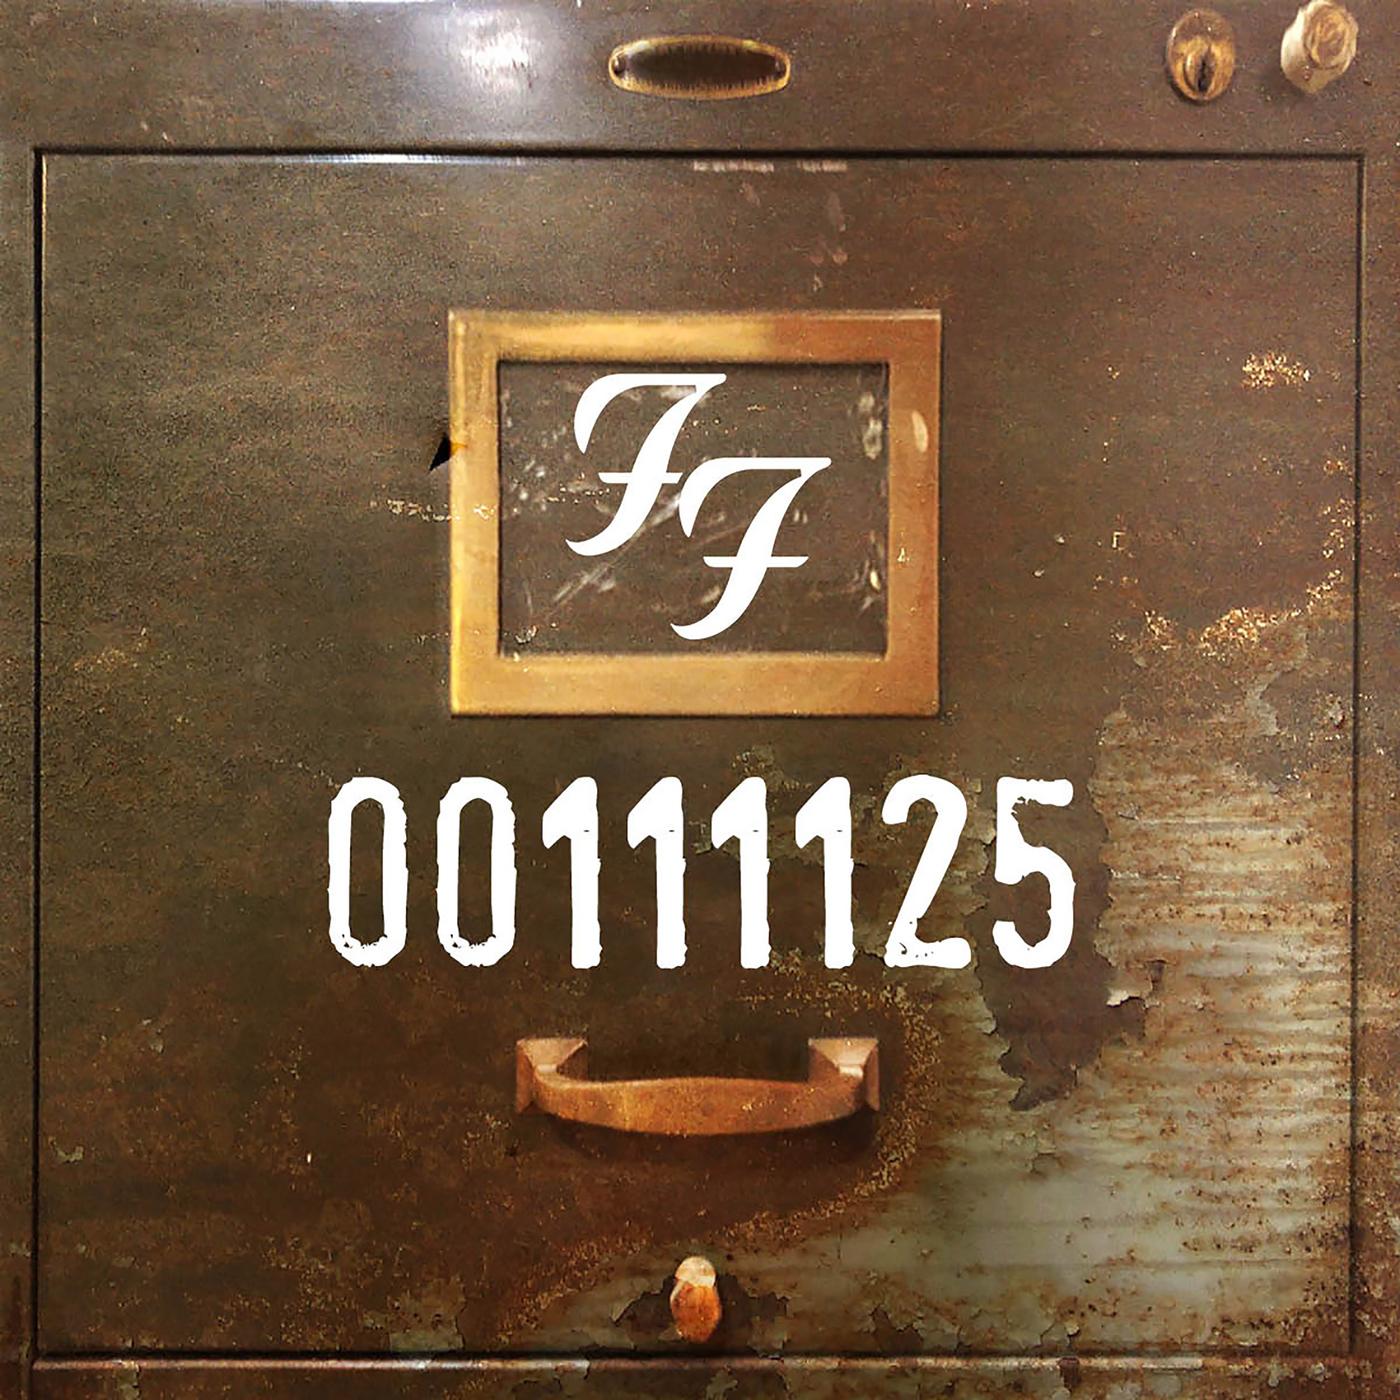 00111125 - Live In London - Foo Fighters